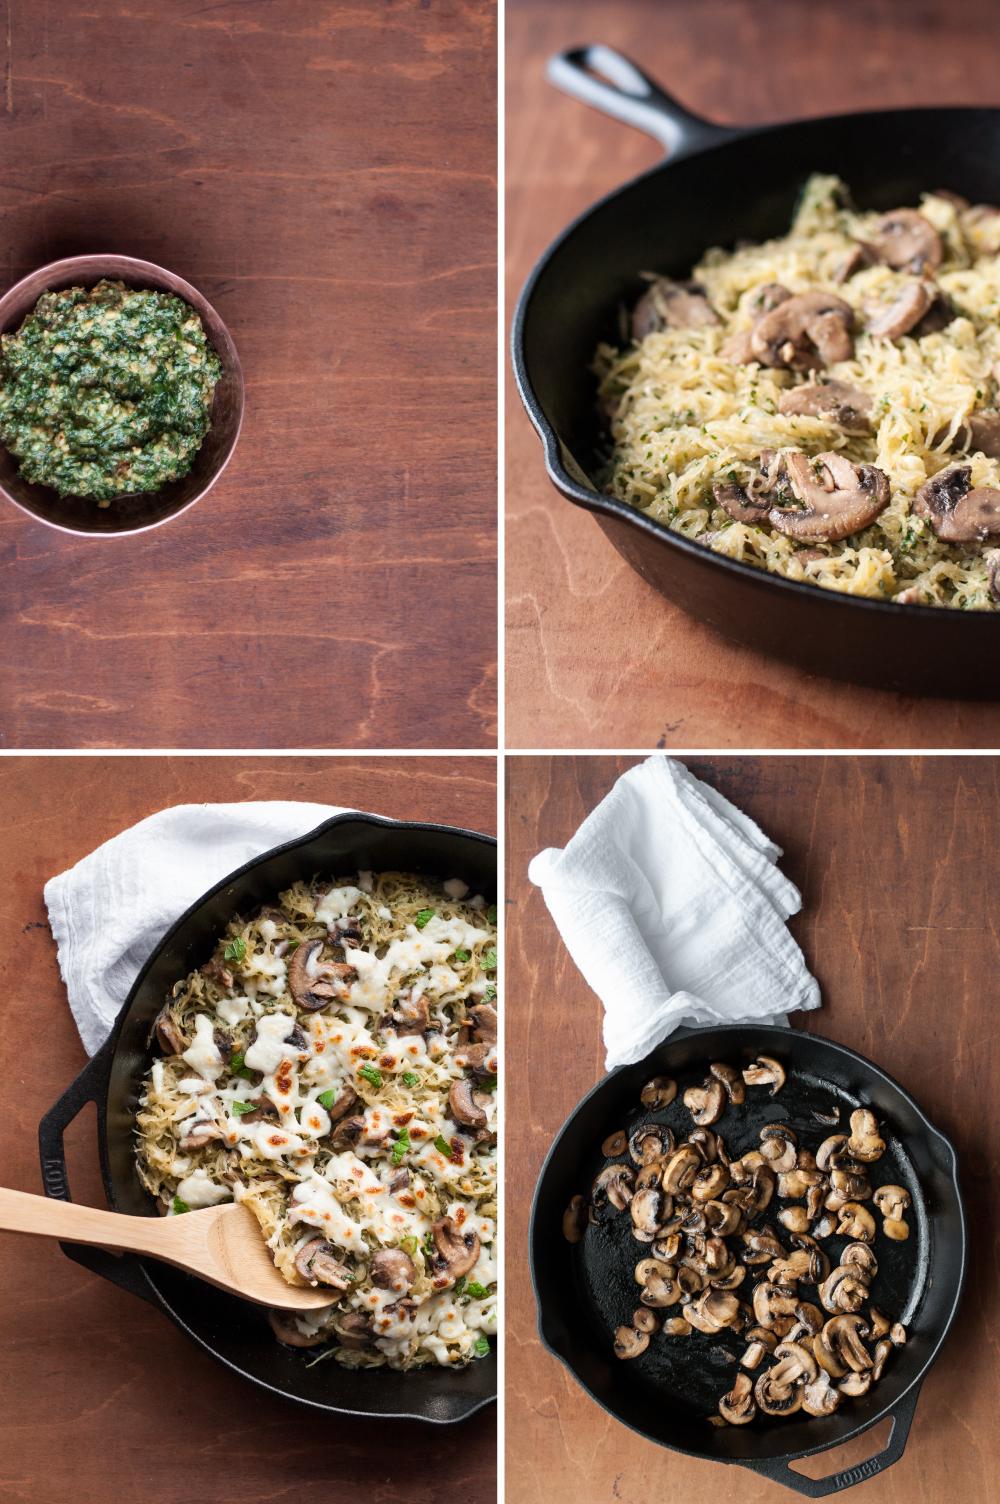 Spaghetti squash with handmade lemony pesto and mushrooms: an easy, meatless, and gluten-free weeknight dinner.